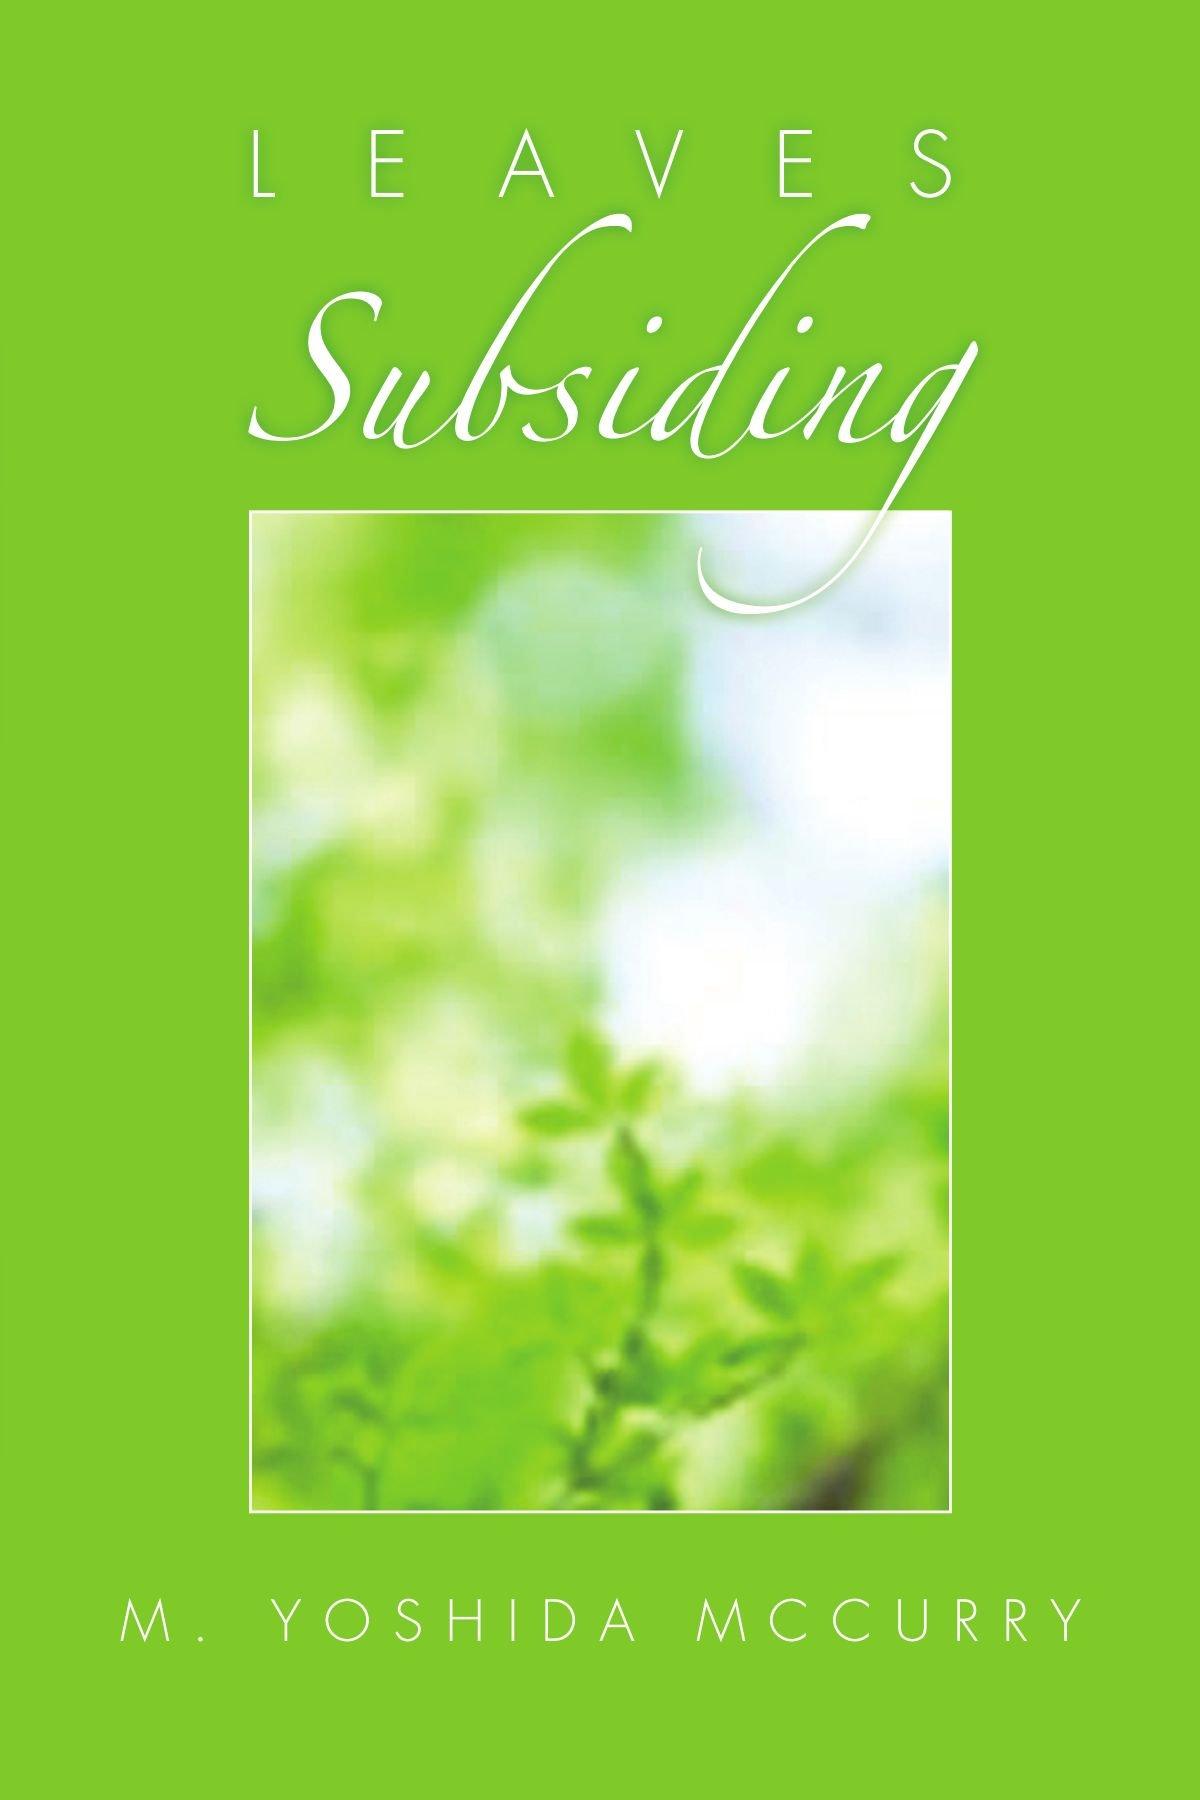 Leaves Subsiding